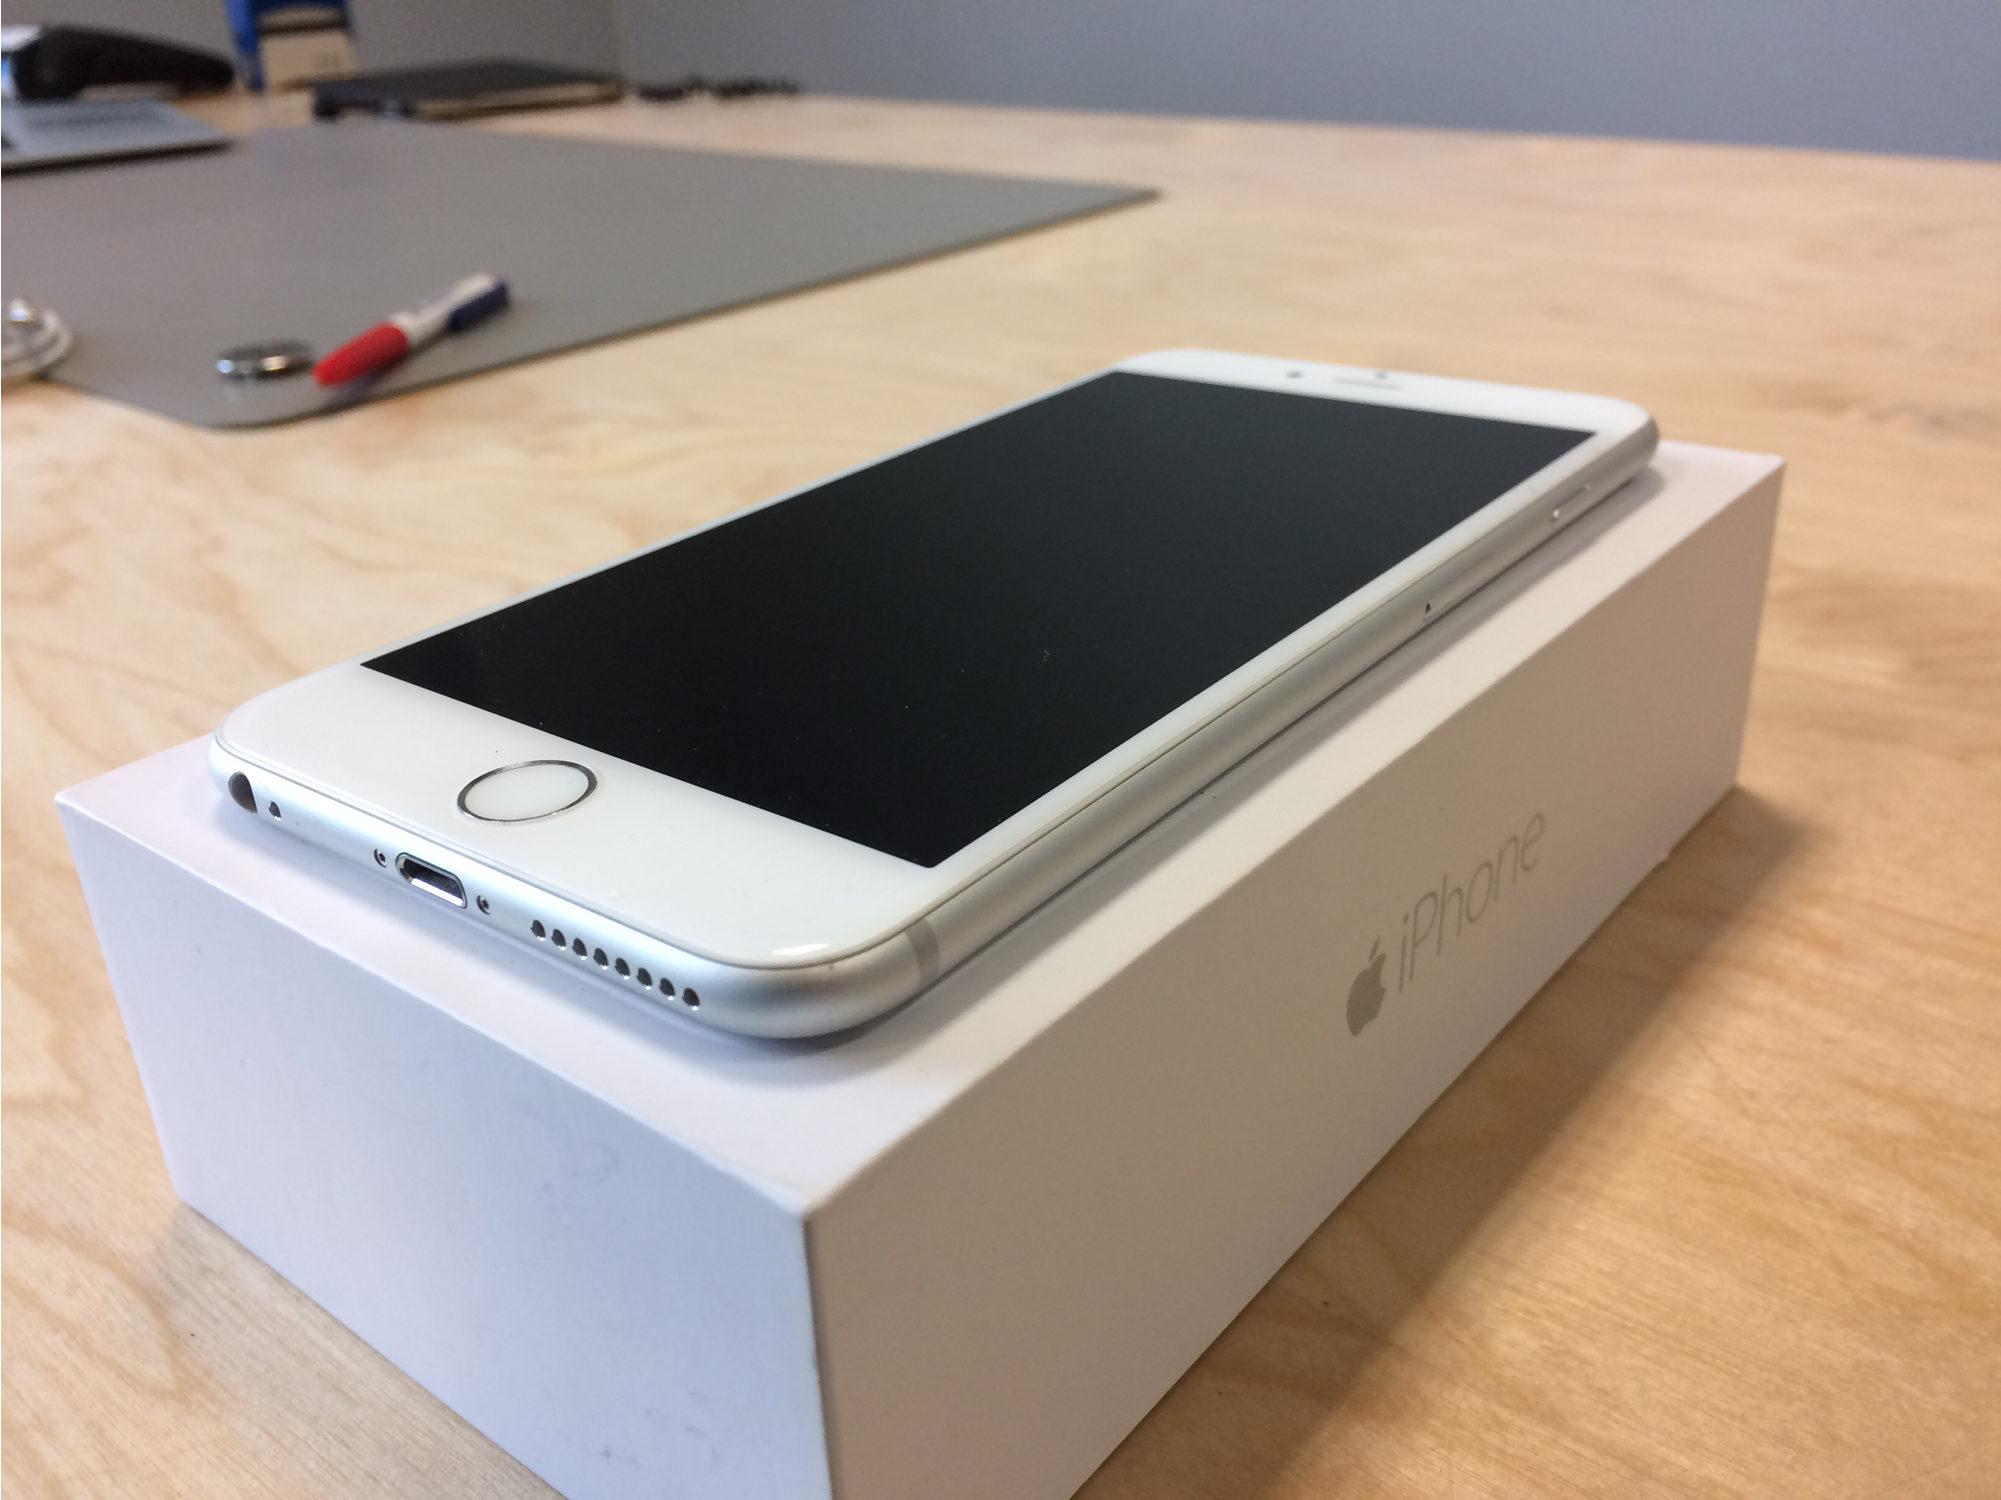 iPhone 6 Plus 64GB, 64GB, Silver, Afbeelding 5